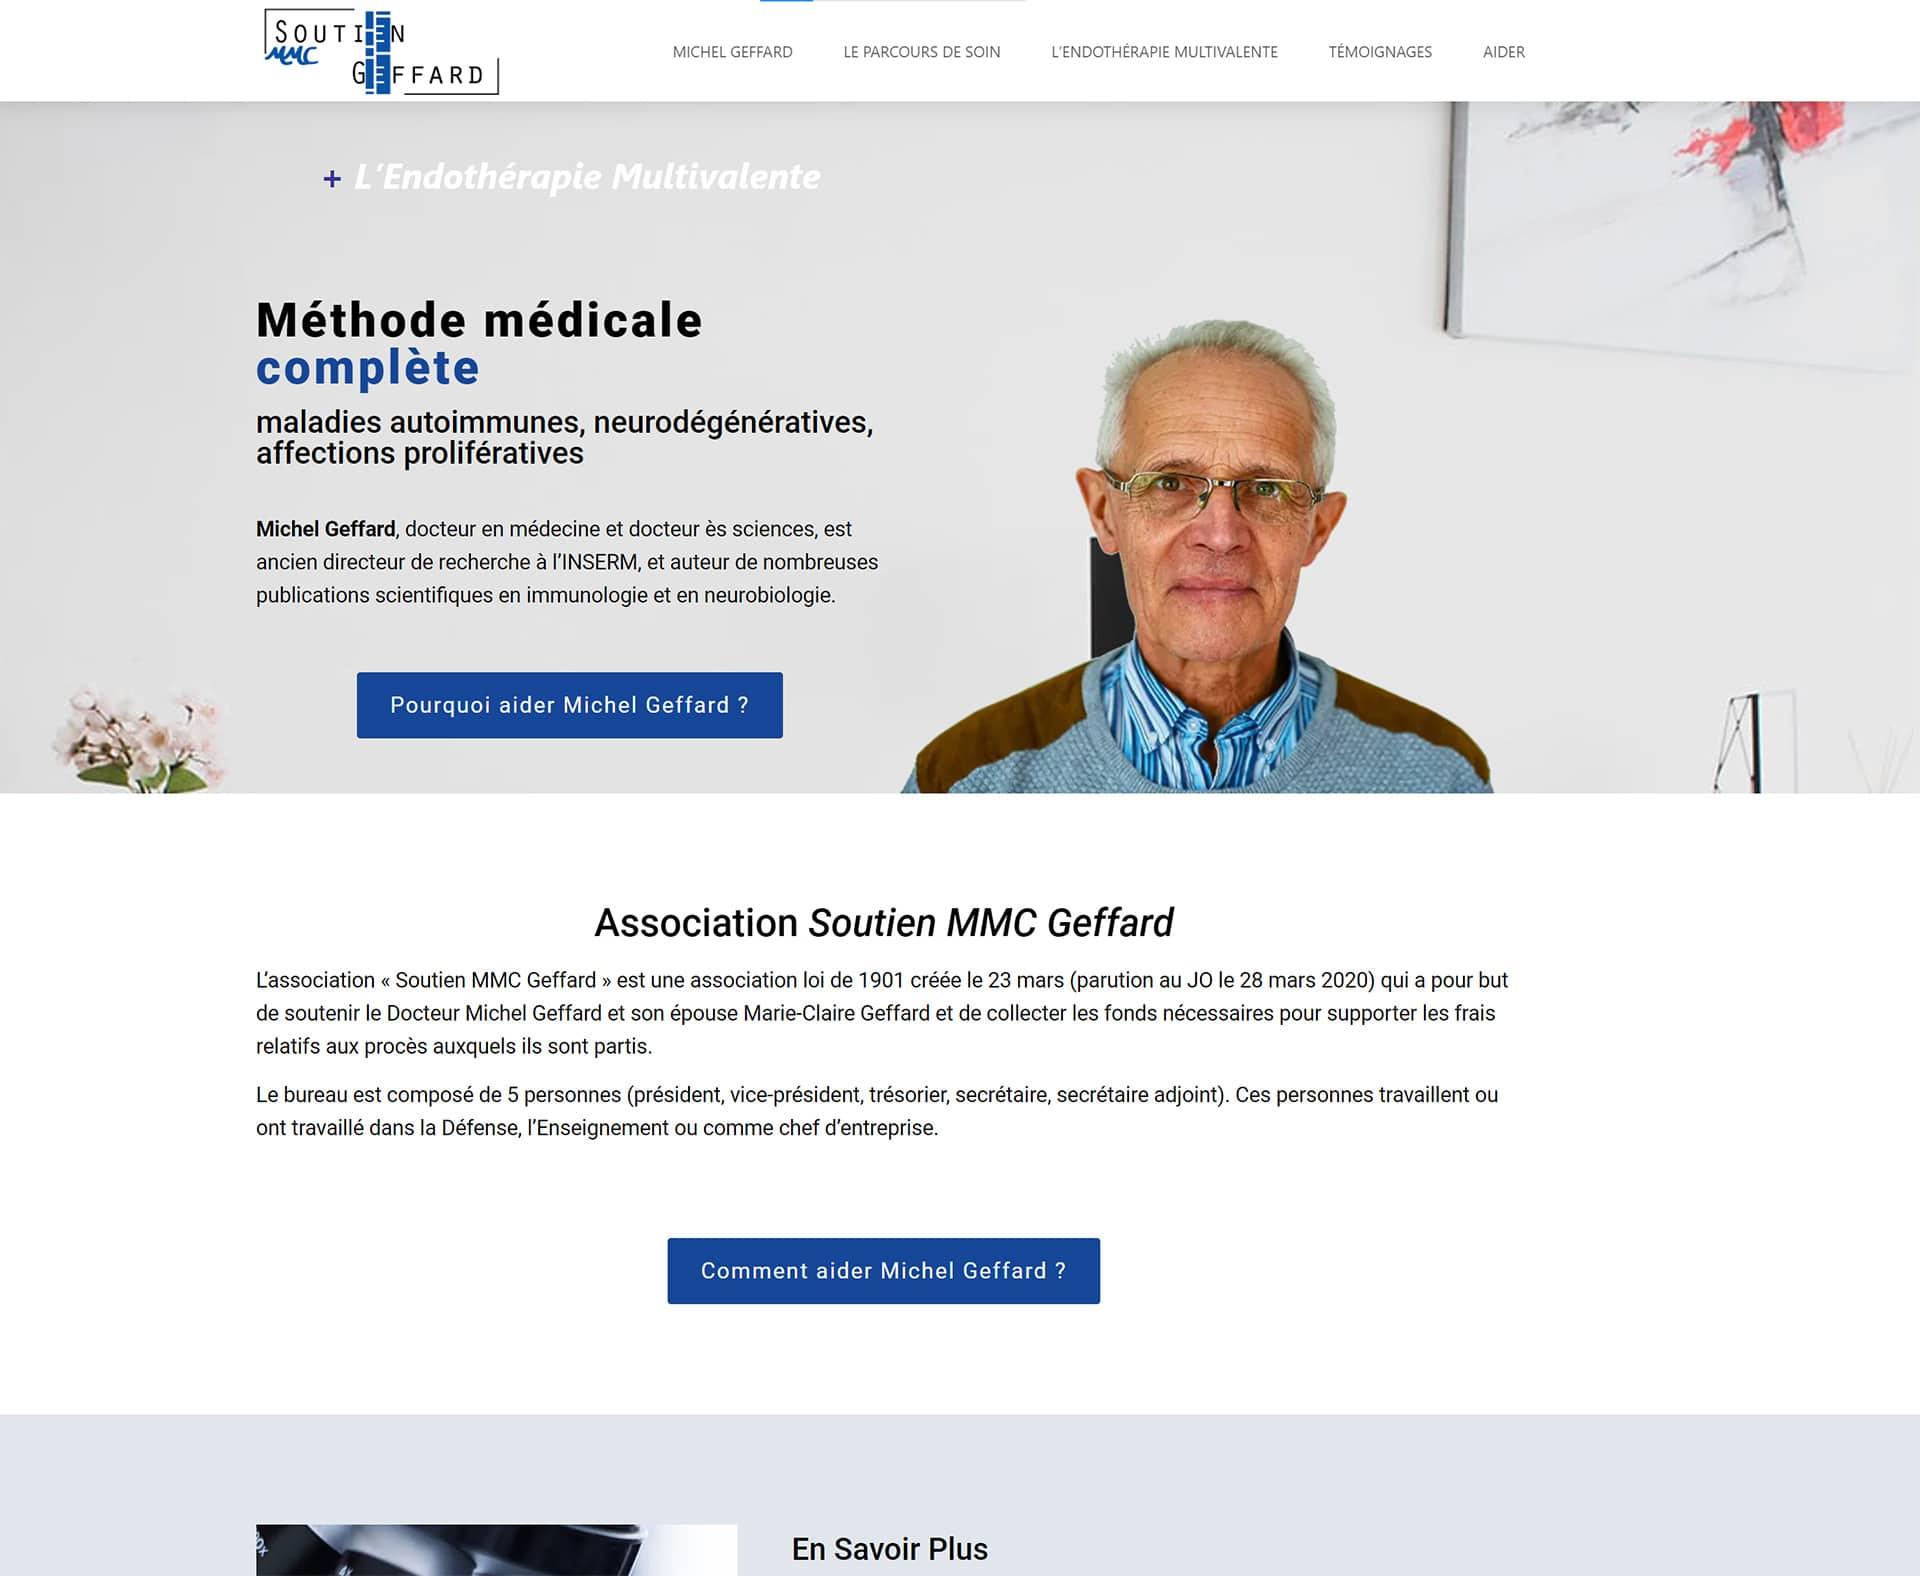 Site mmc-geffard.com